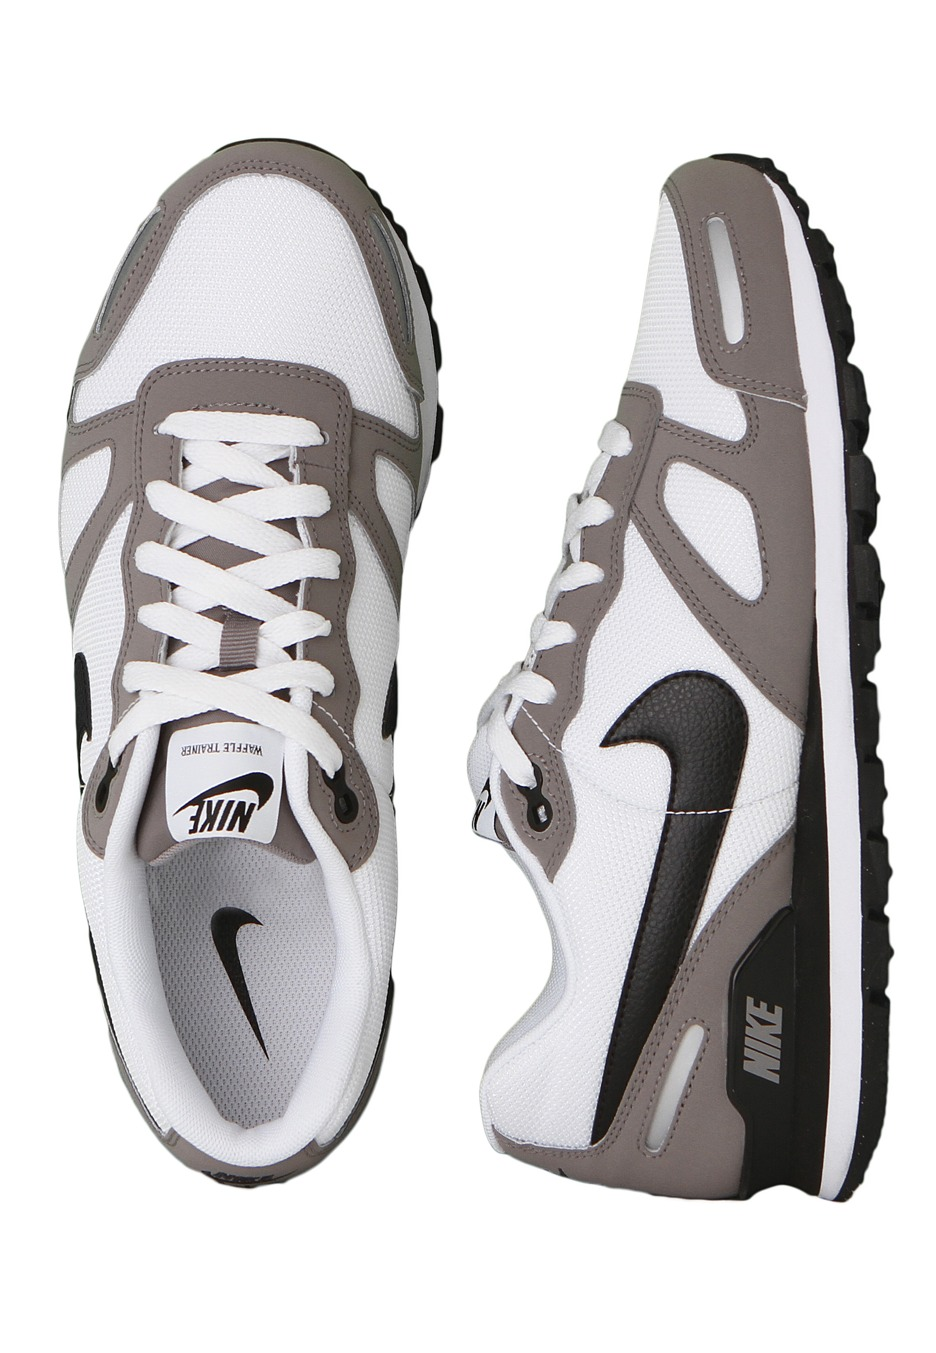 1e42de99ea6 Nike - Air Waffle Trainer Sport Grey Black White Metallic Silver - Shoes -  Impericon.com UK